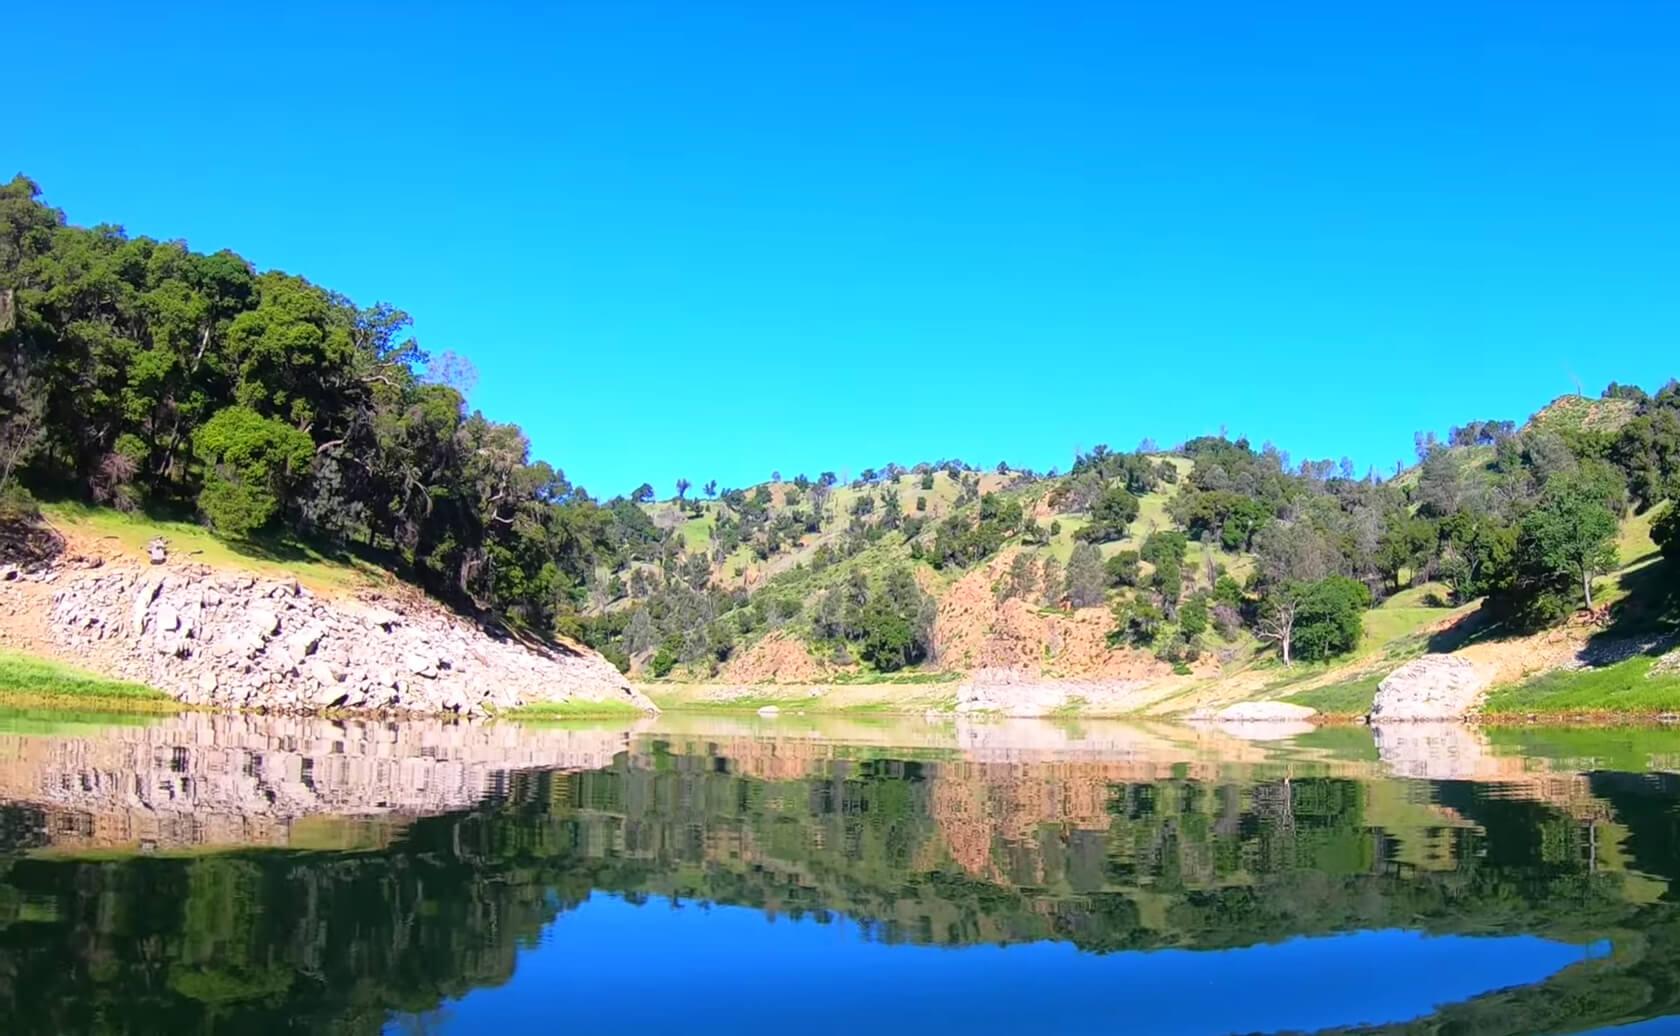 Nacimiento-Lake-Fishing-Guide-Report-California-01